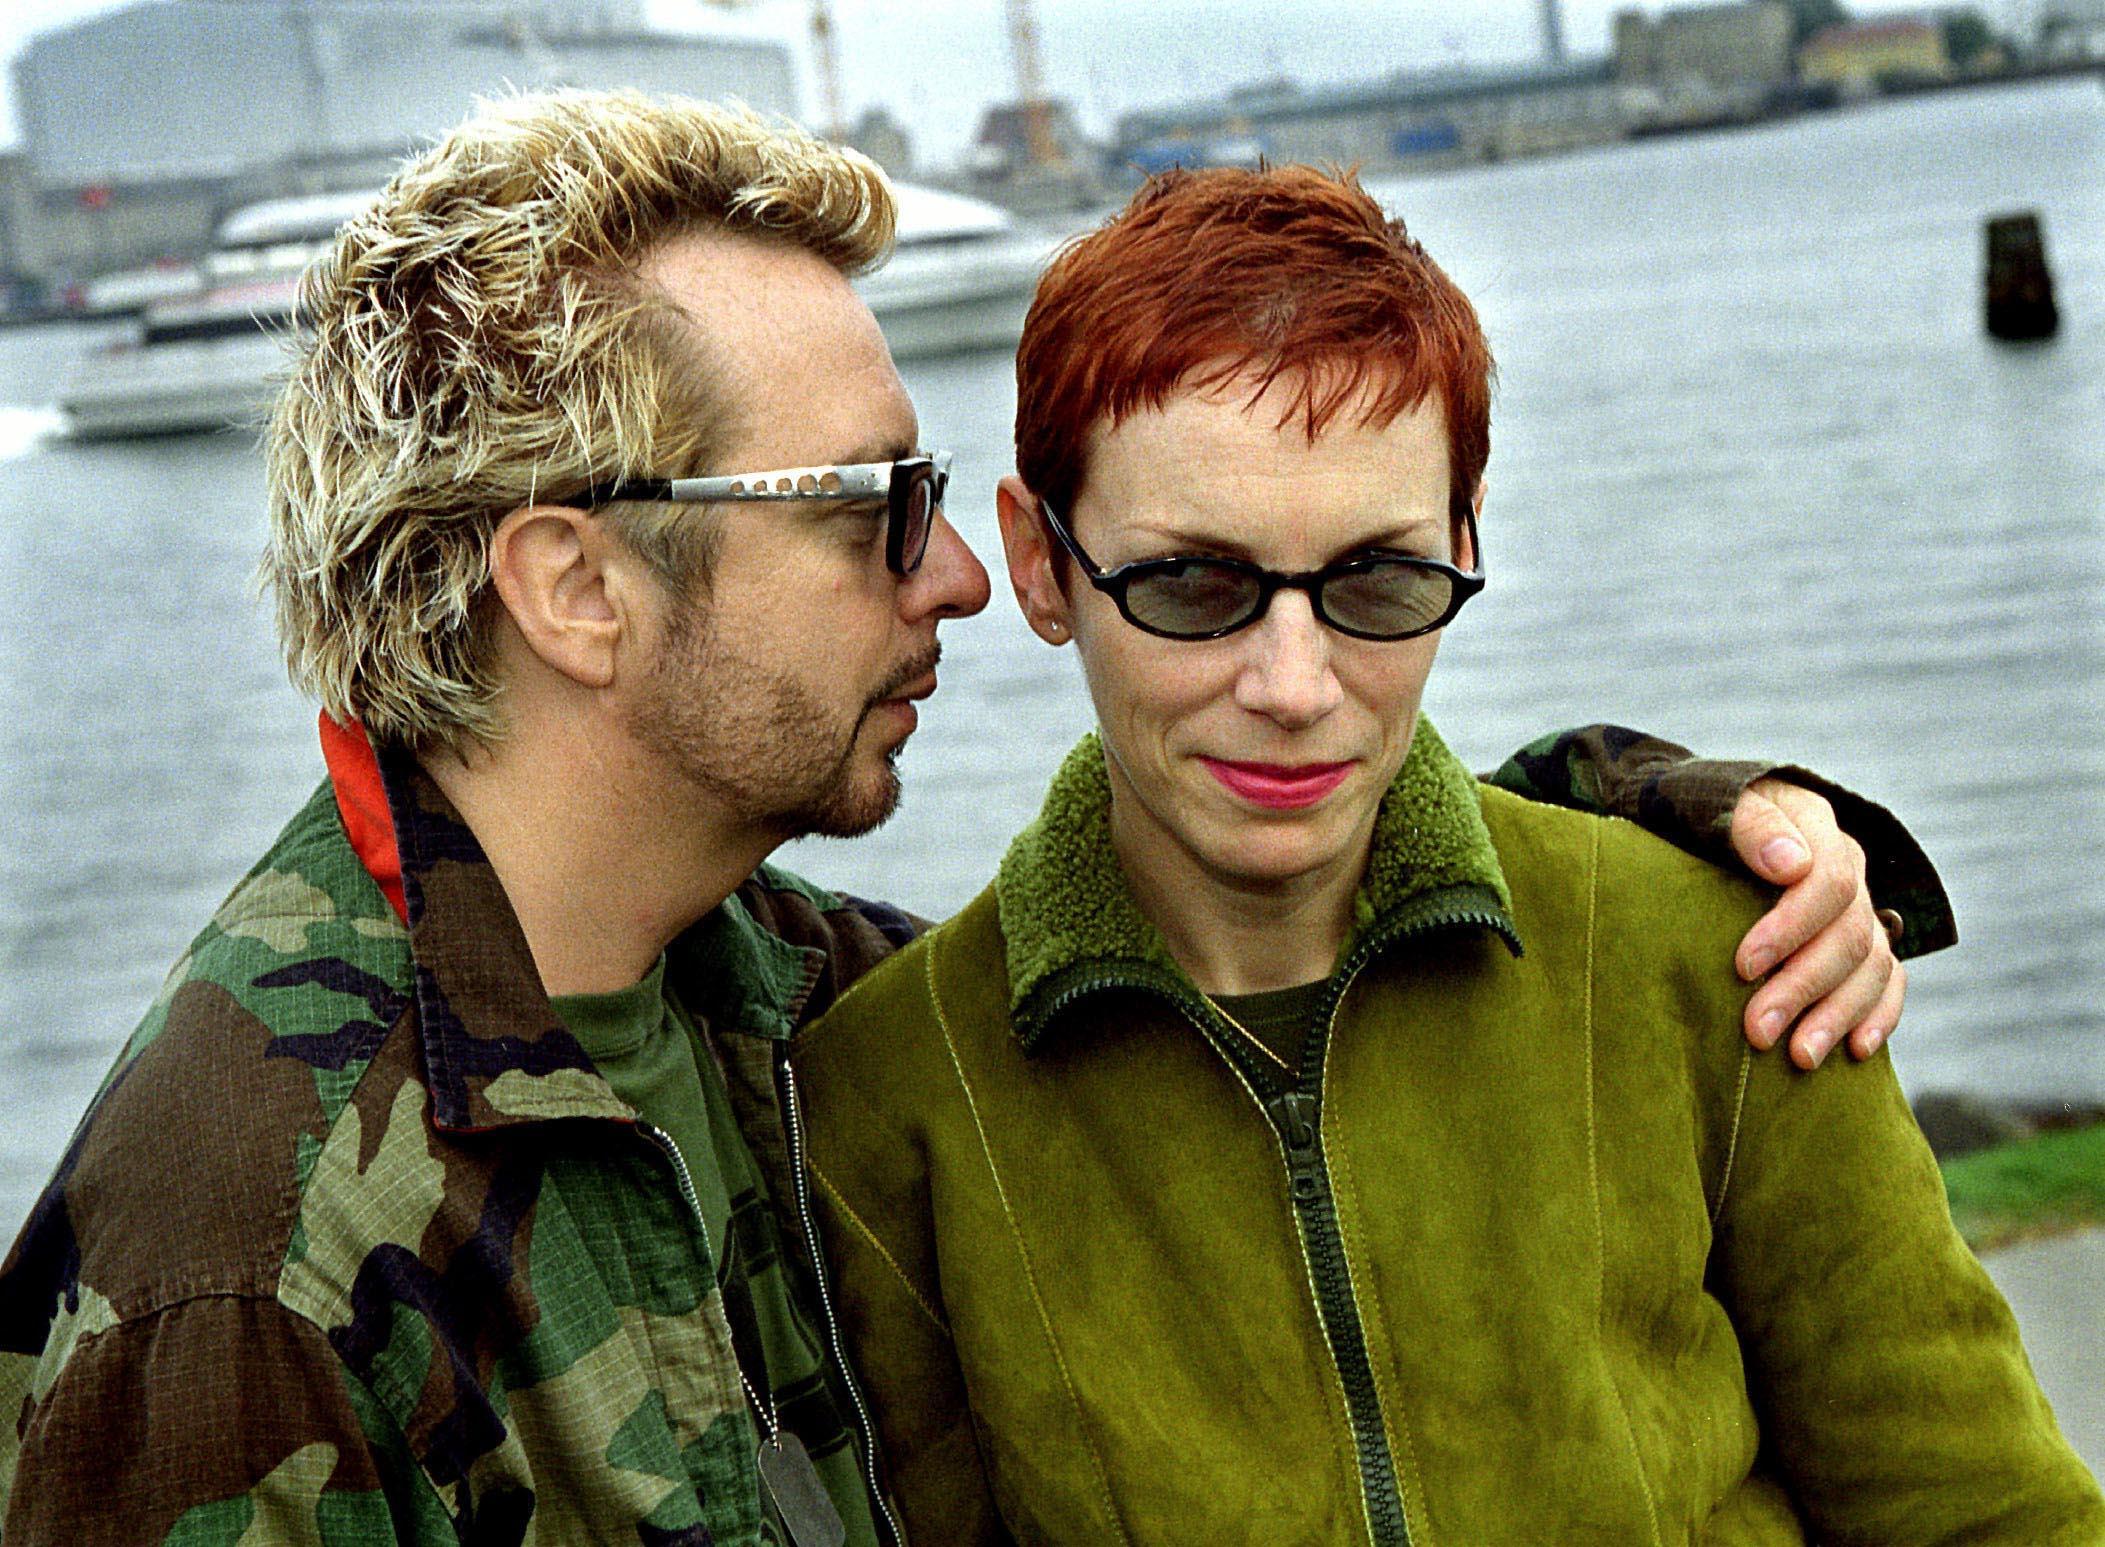 EURYTHMICS GIVE LIVE PERFORMANCE IN COPENHAGEN  British pop musicians ANNIE LENNOX and DAVE STEWART have re-established their